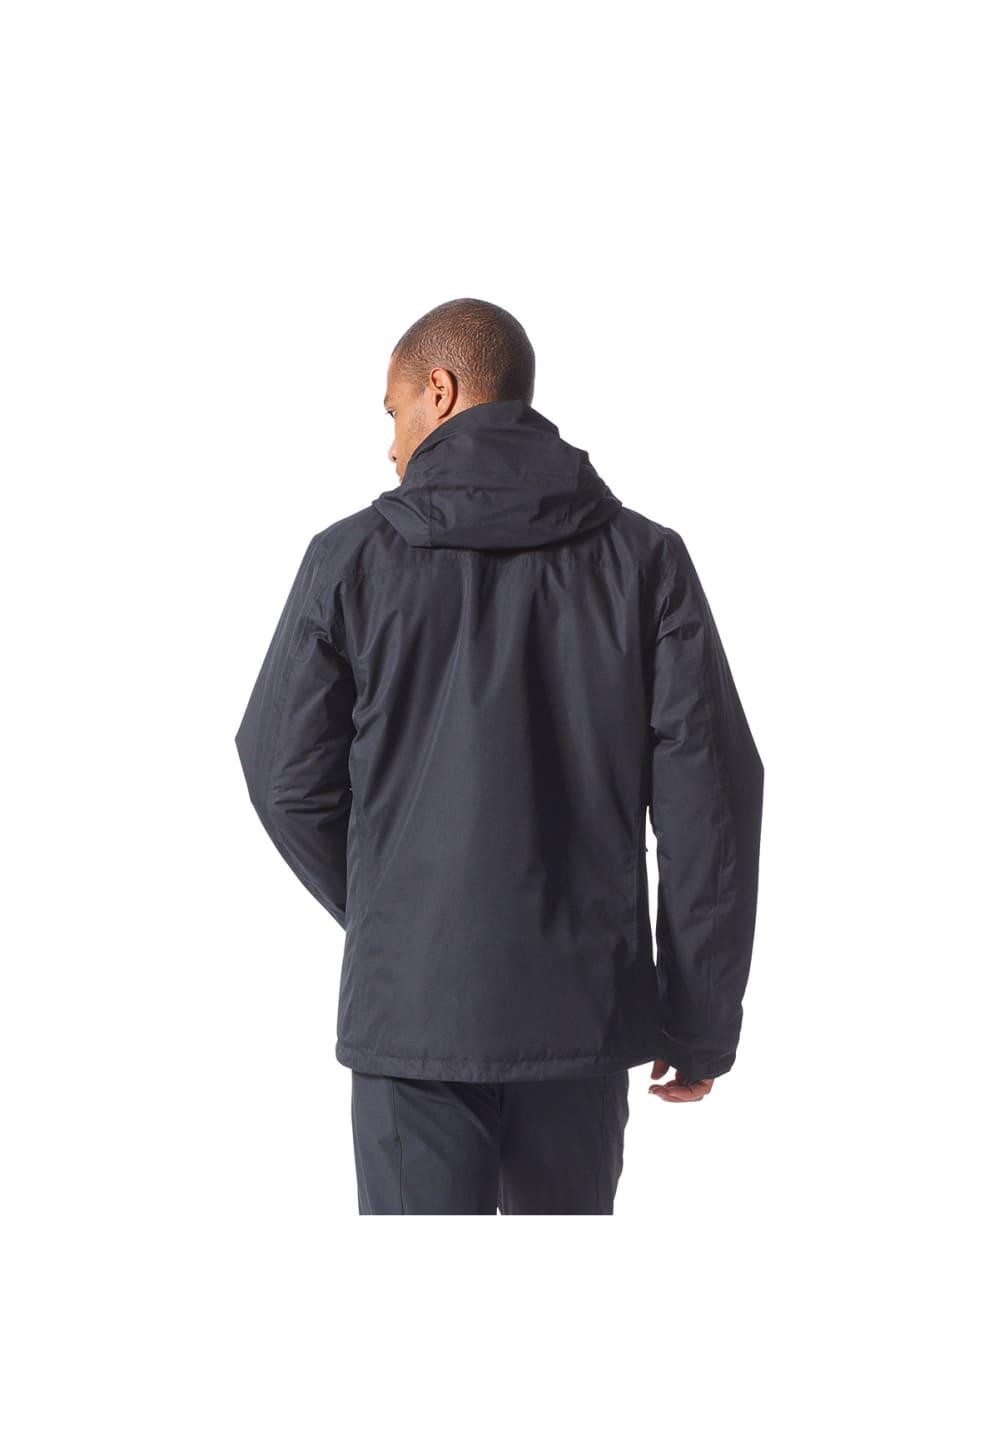 veste reflechissante homme adidas